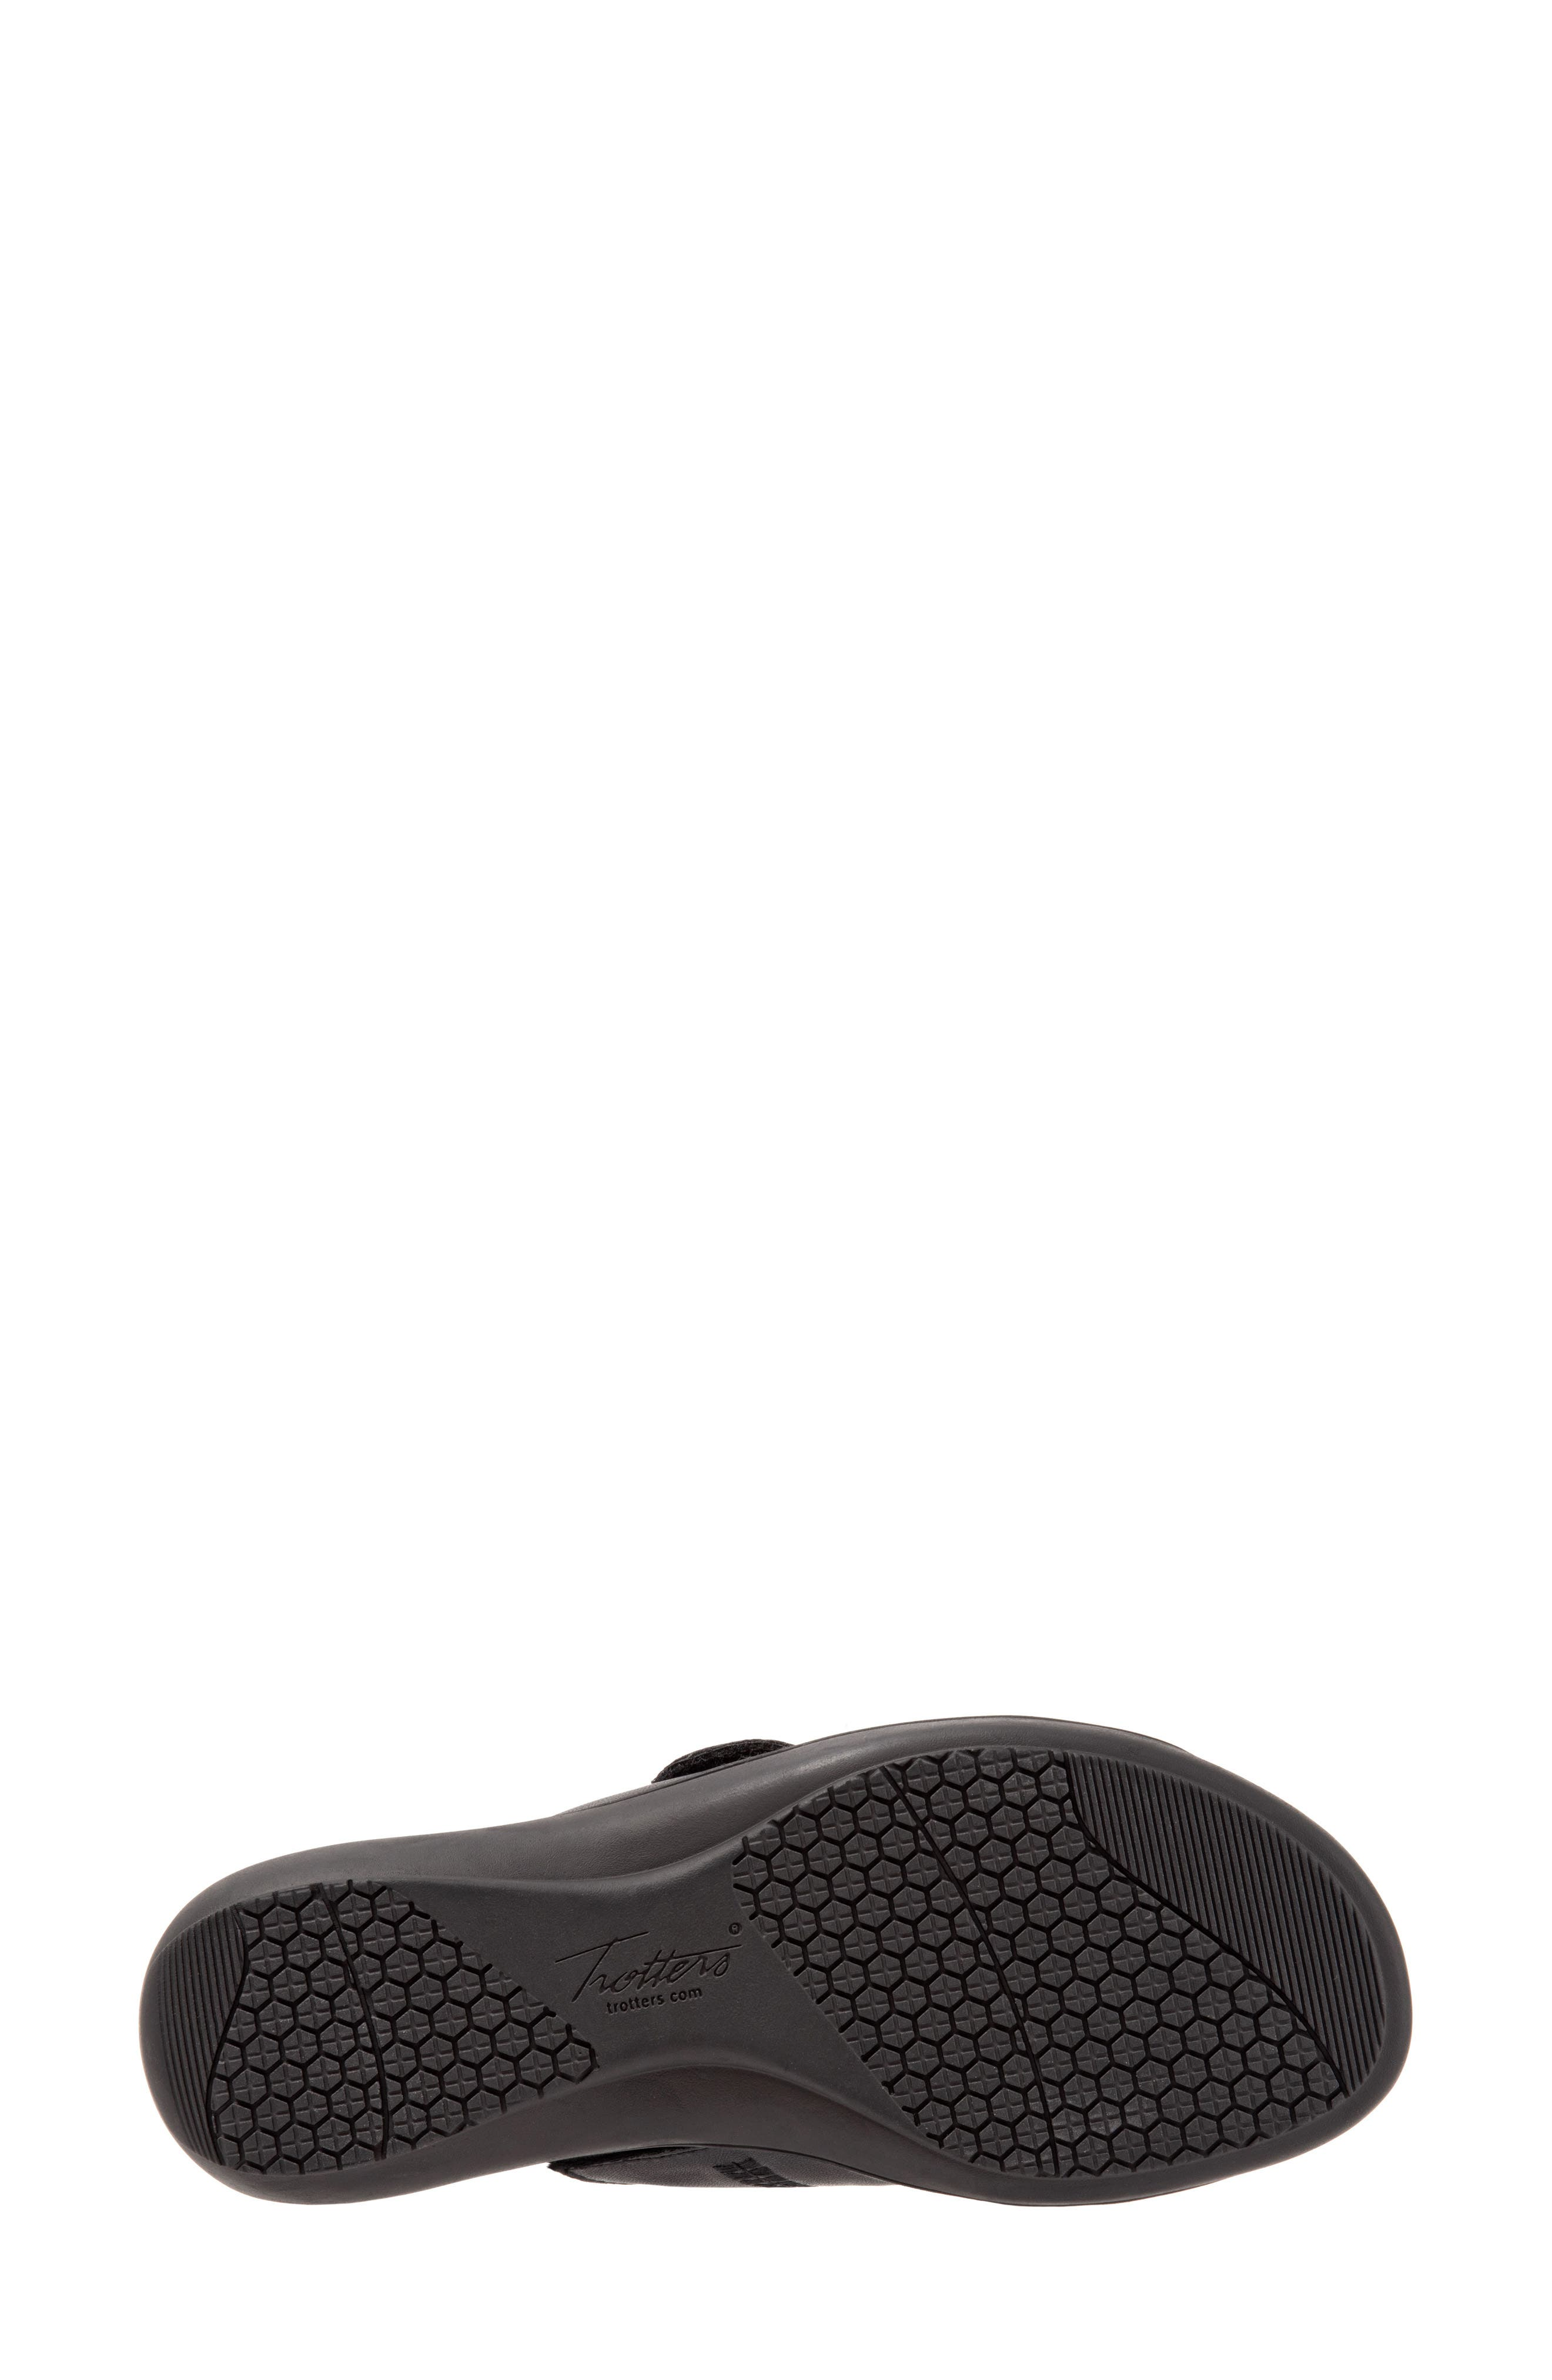 Vale Double Strap Slide Sandal,                             Alternate thumbnail 6, color,                             BLACK LEATHER